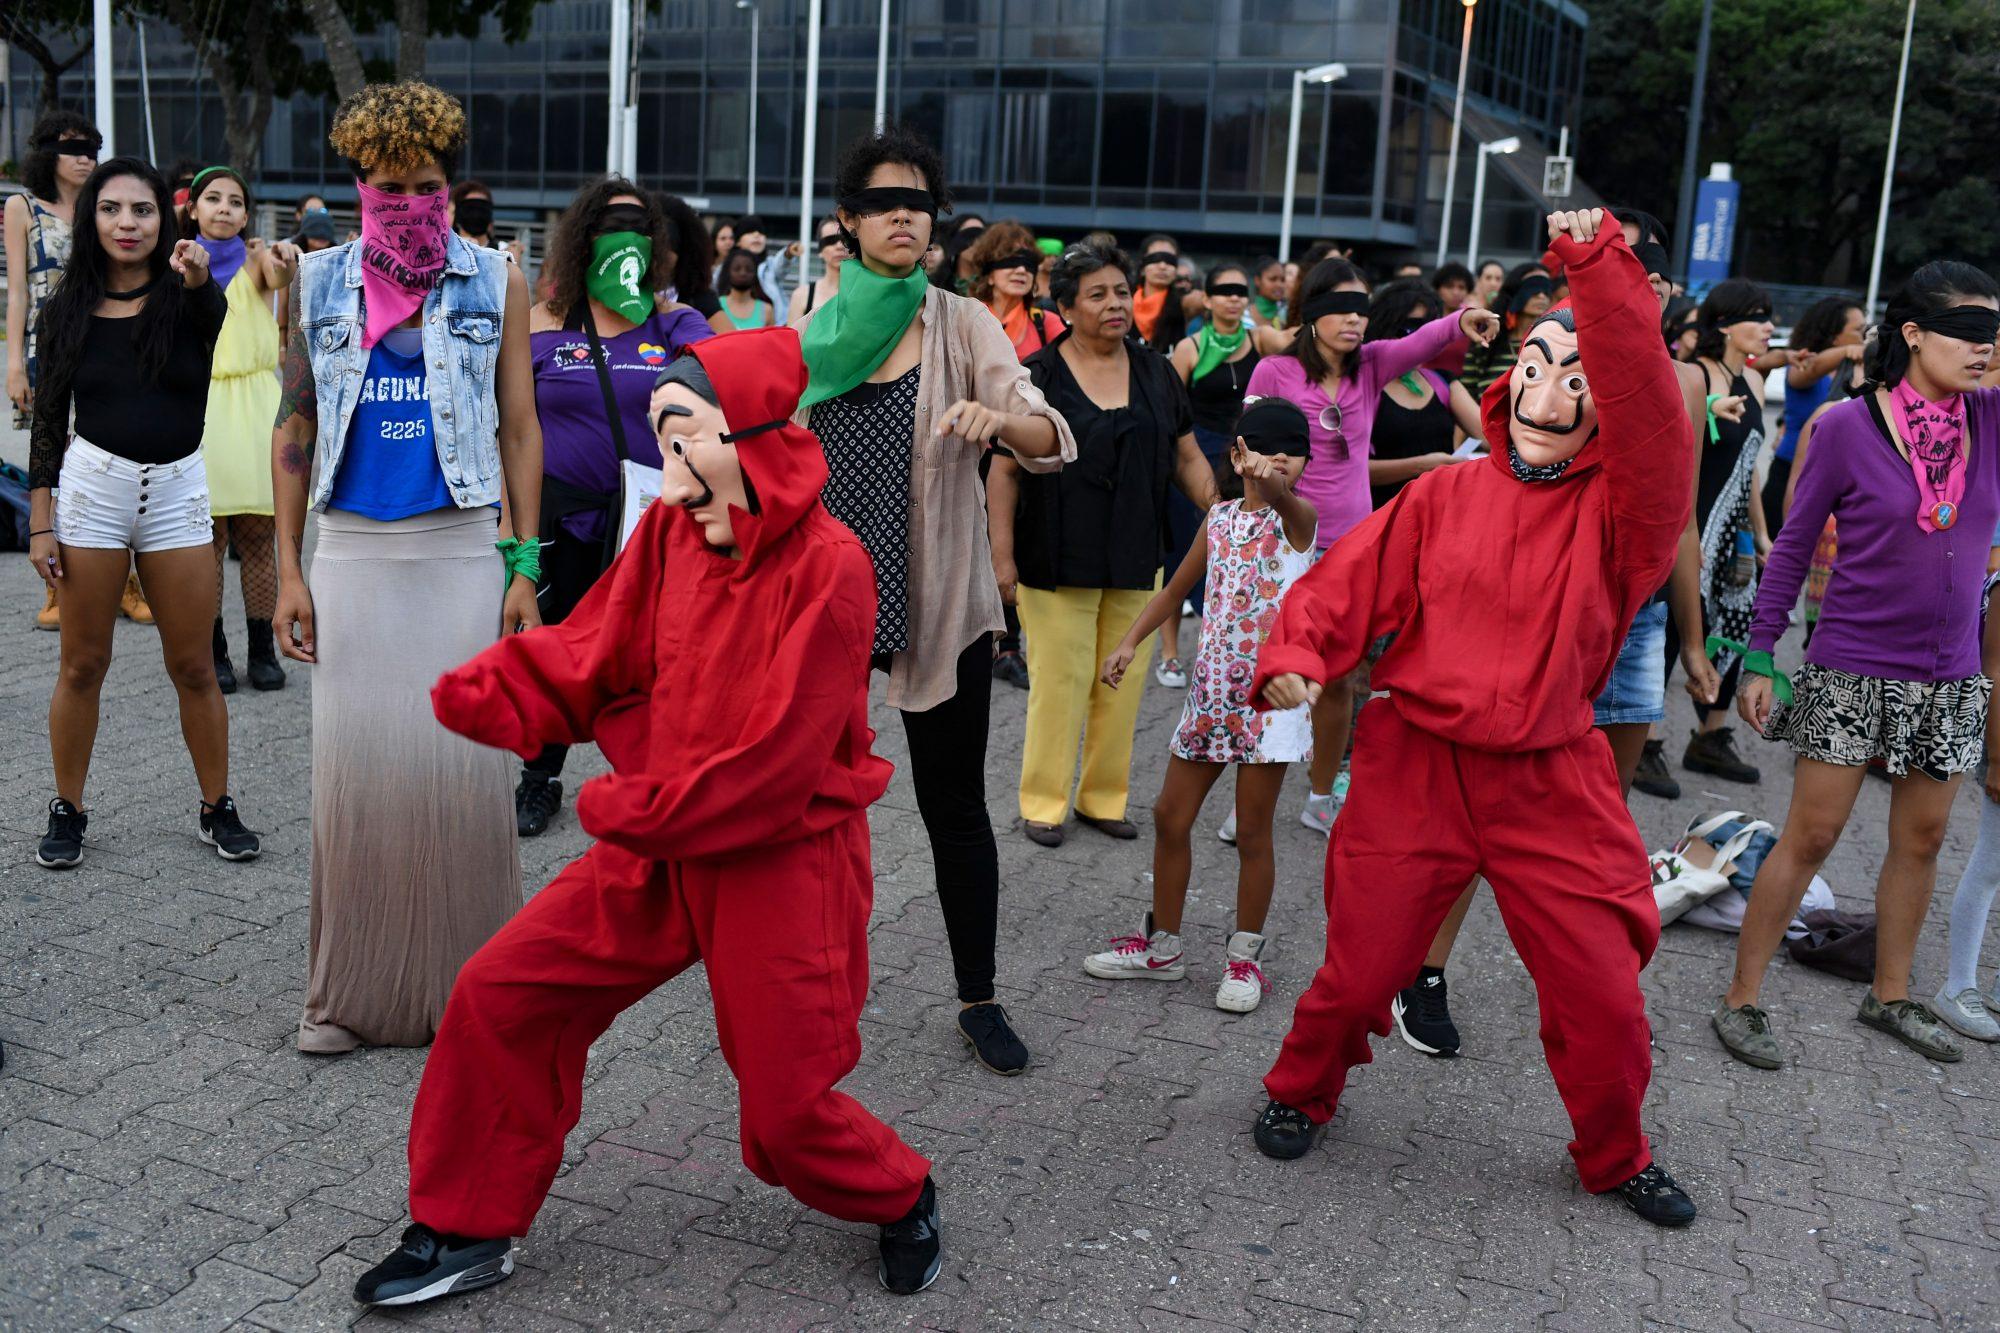 VENEZUELA-CRISIS-WOMEN-PROTEST